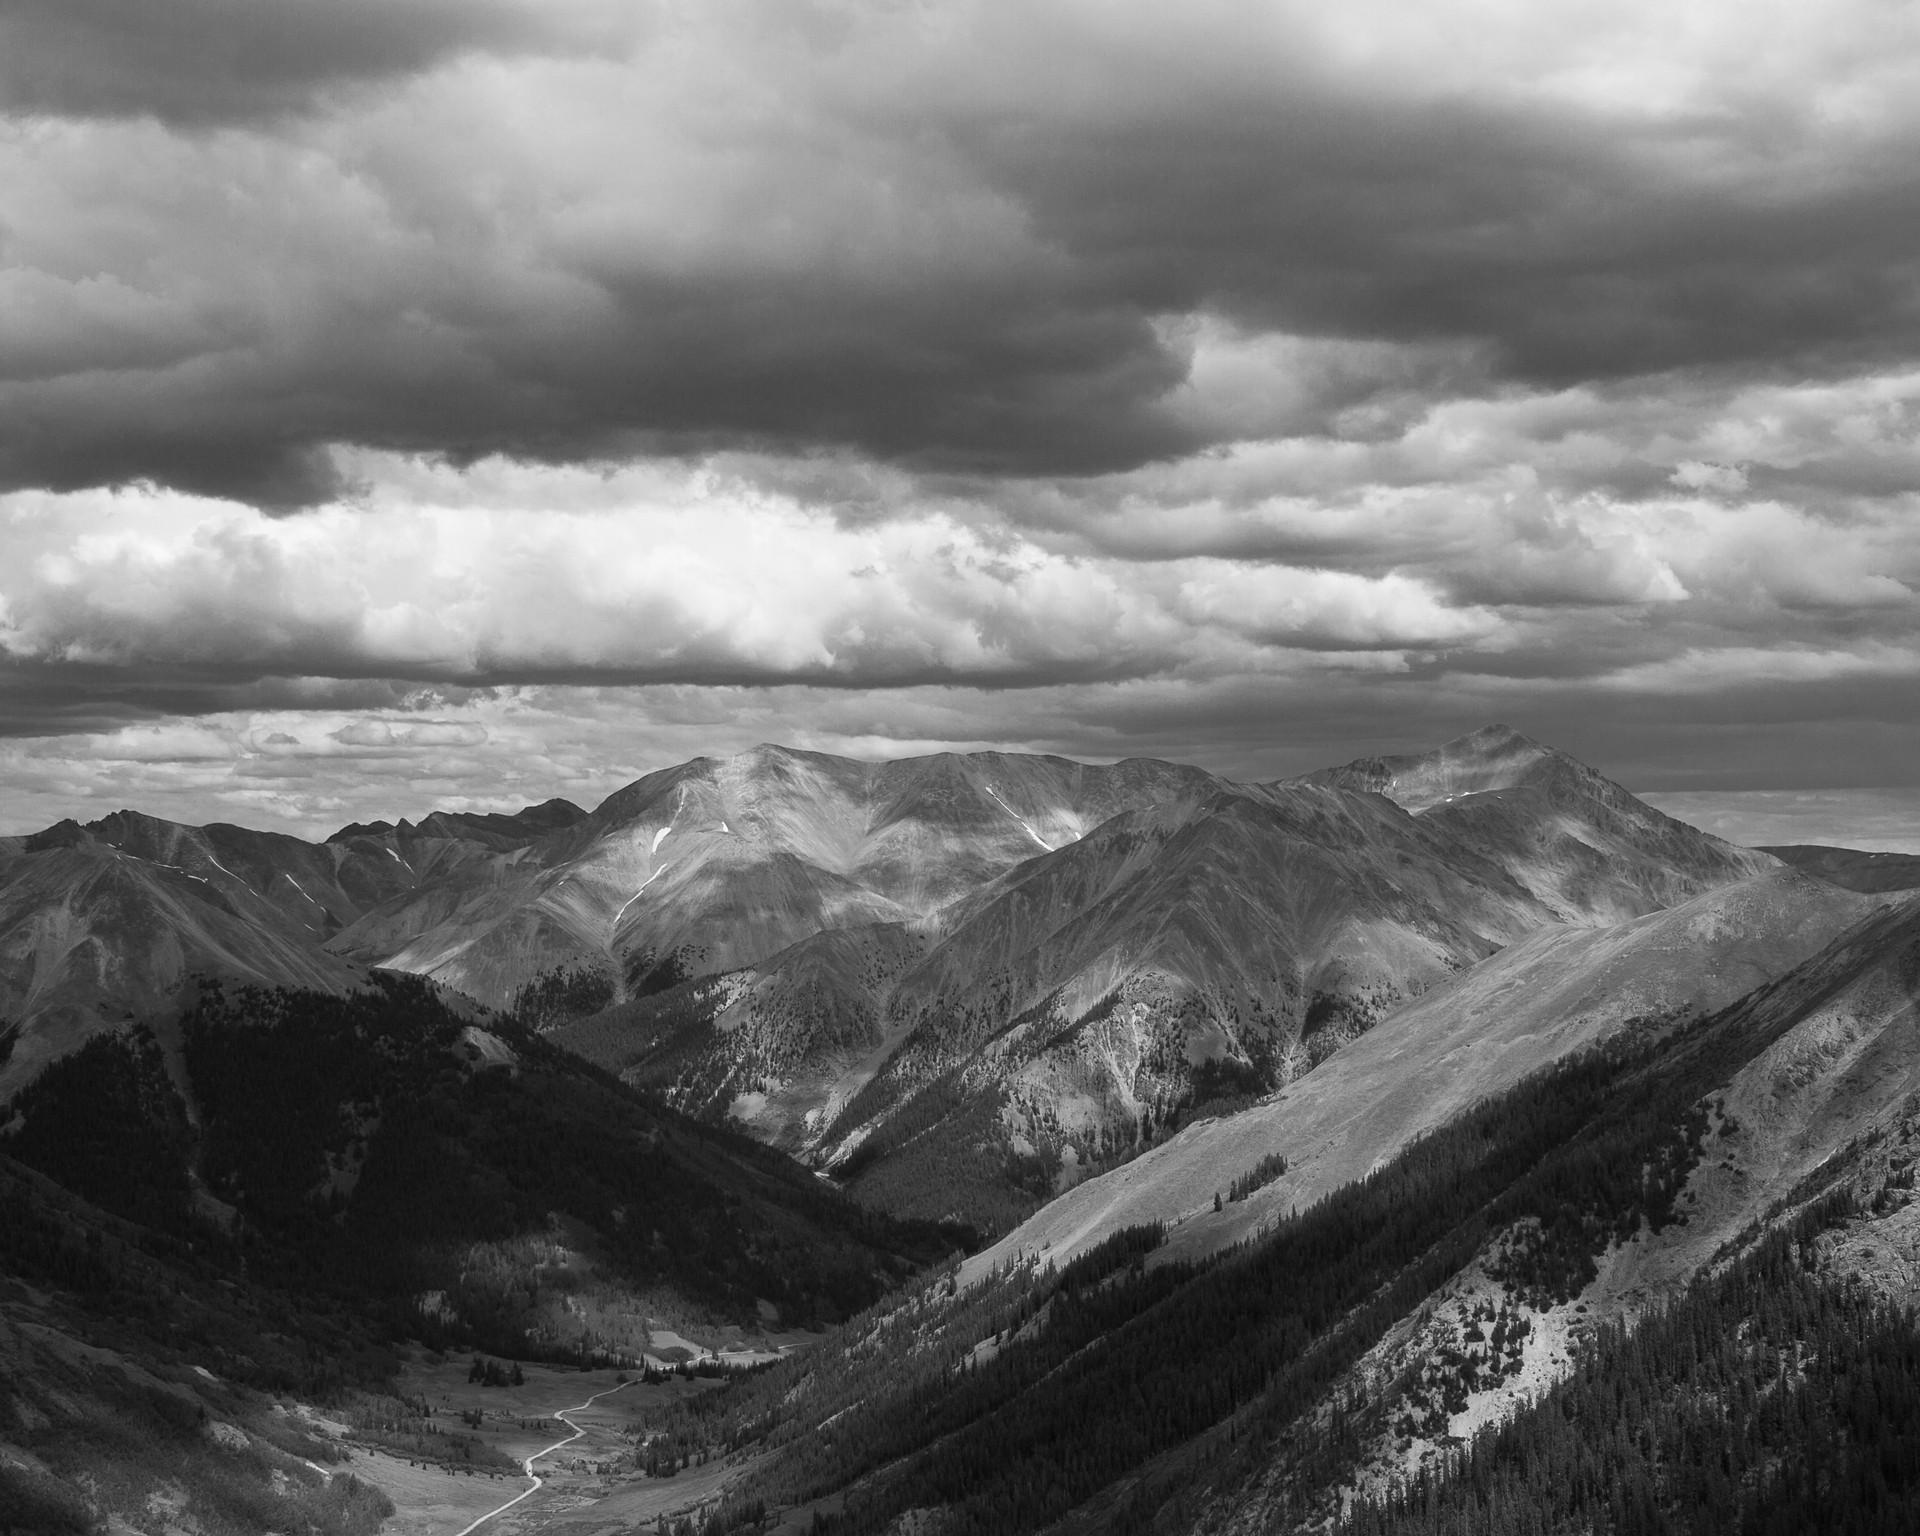 Sunshine Peak and Redcloud Peak